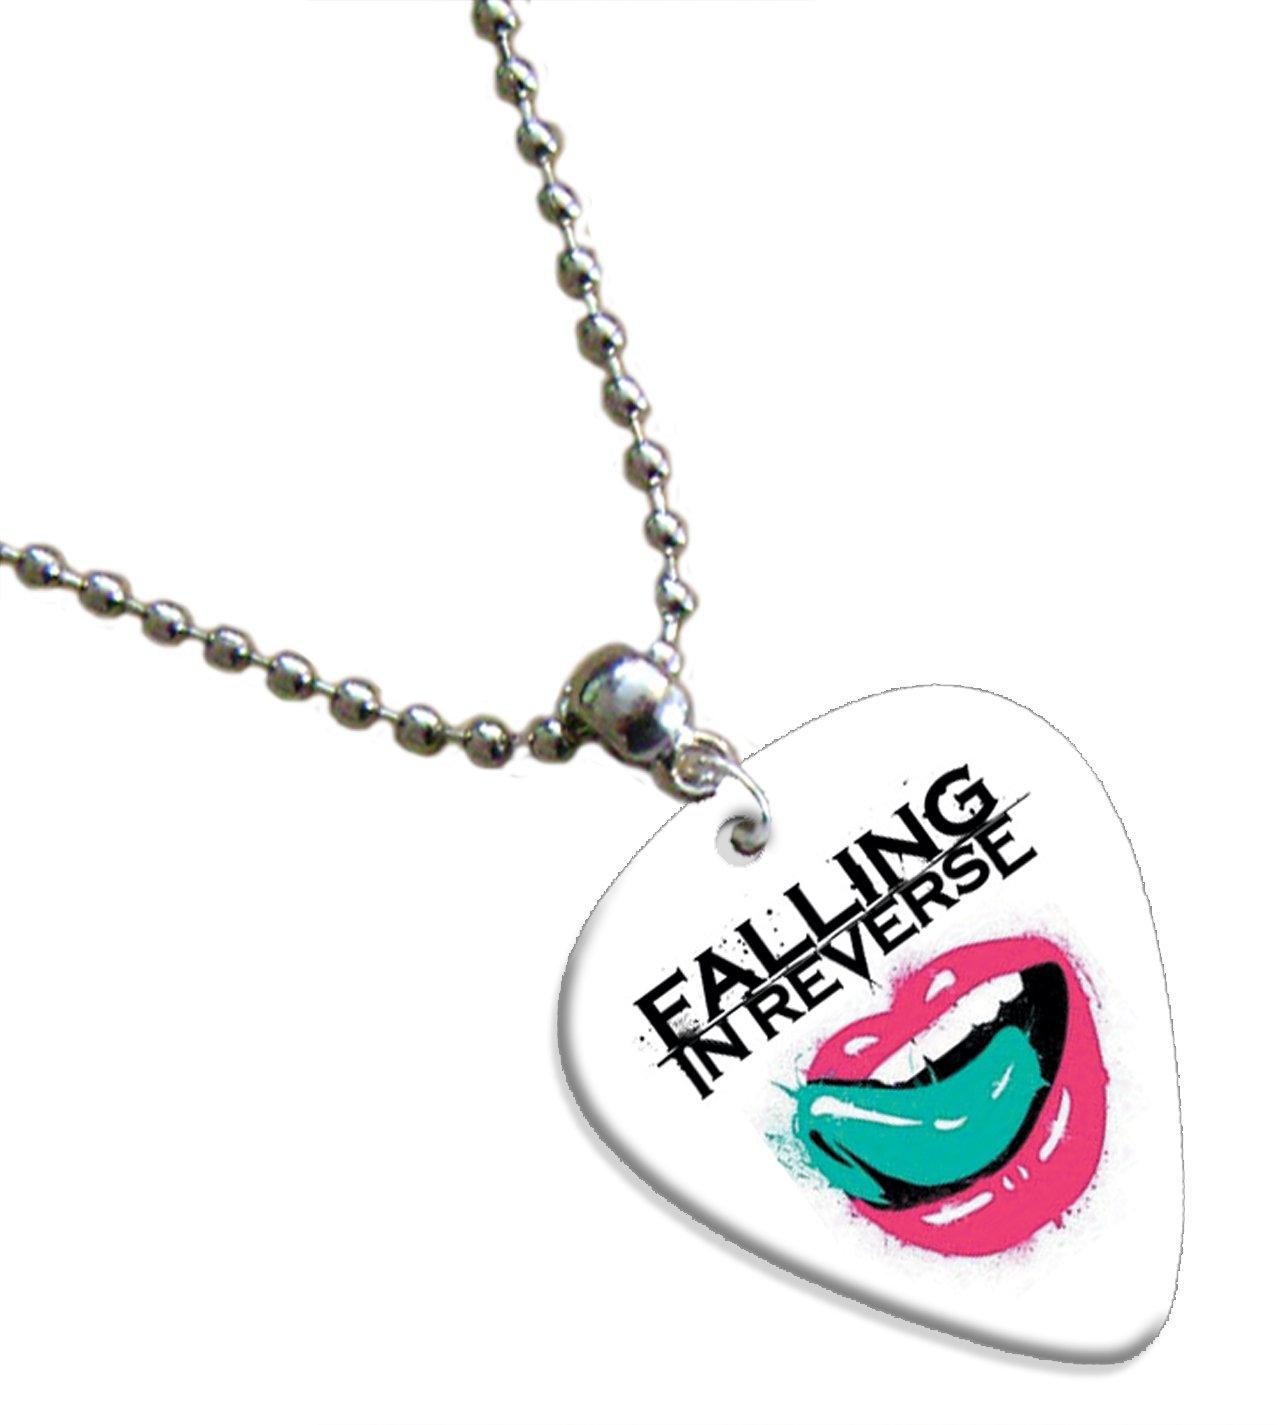 Amazon.com: Falling In Reverse Púa De Guitarra Collar banda ...